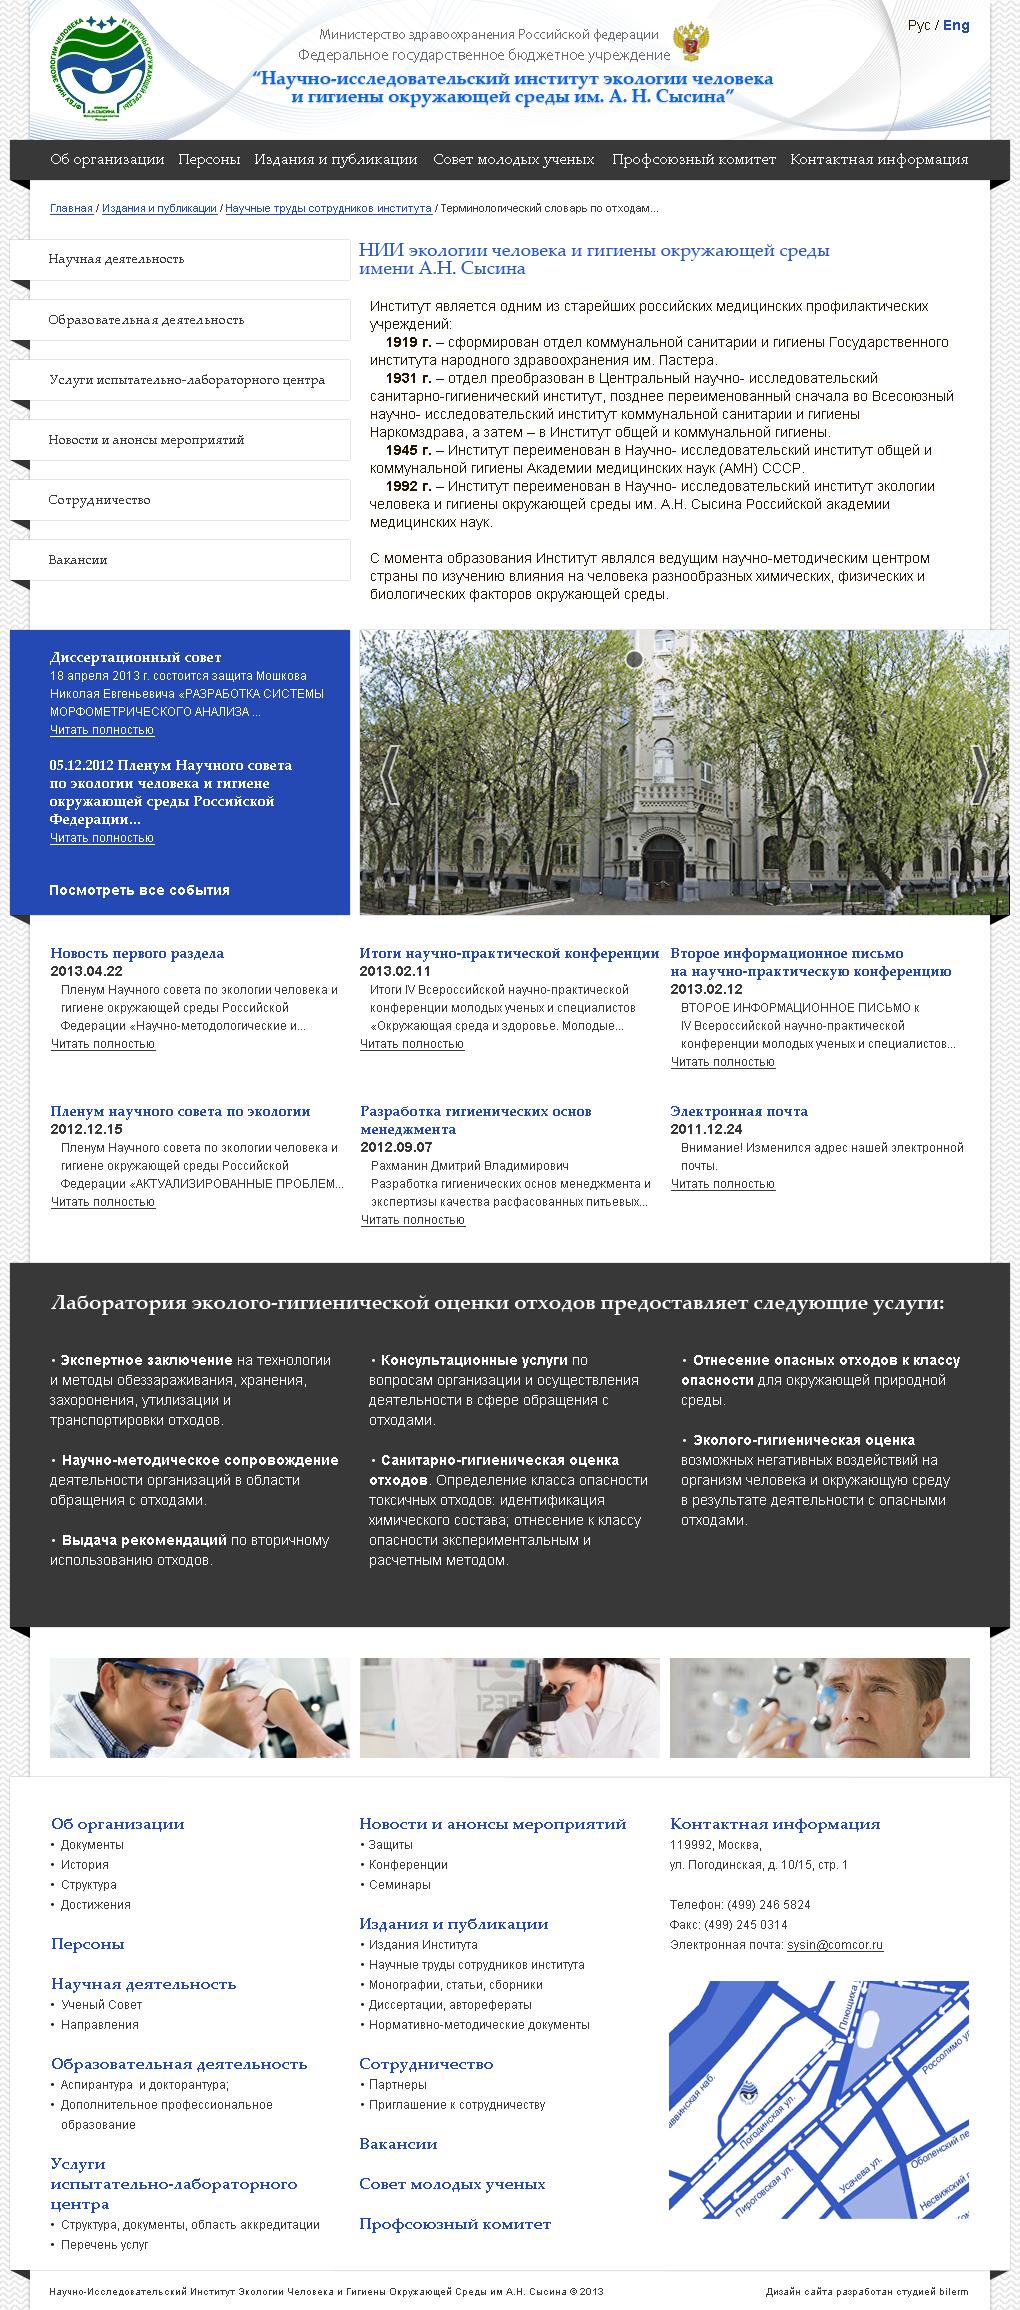 Редизайн сайта научно-исследовательского института фото f_663514b5285f0ed5.png